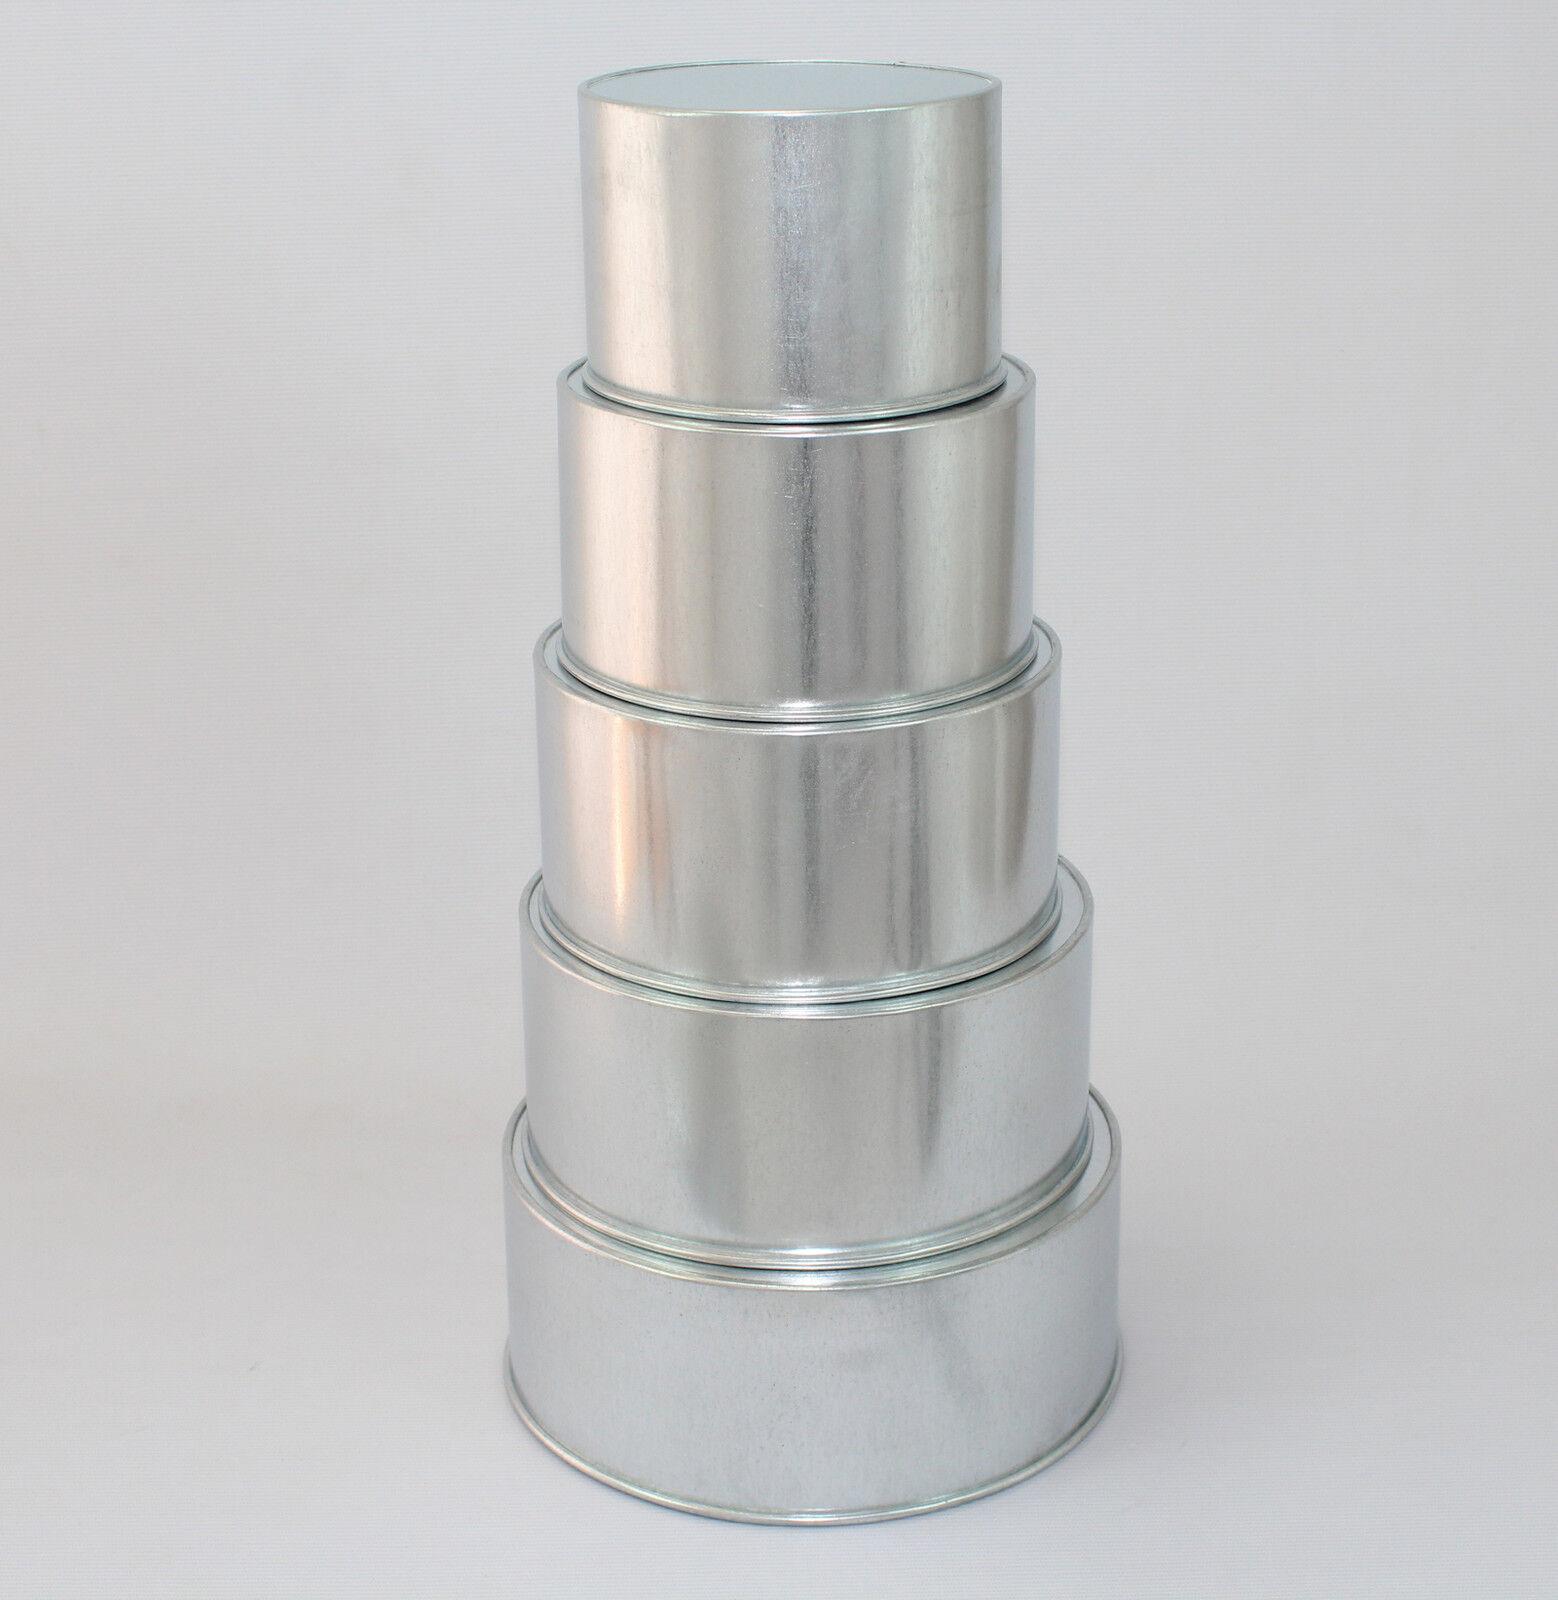 Round Cake Baking Tins - 3  Deep Deep Deep - 5 Tier ( 6 7 8 9 10  ) ac3261